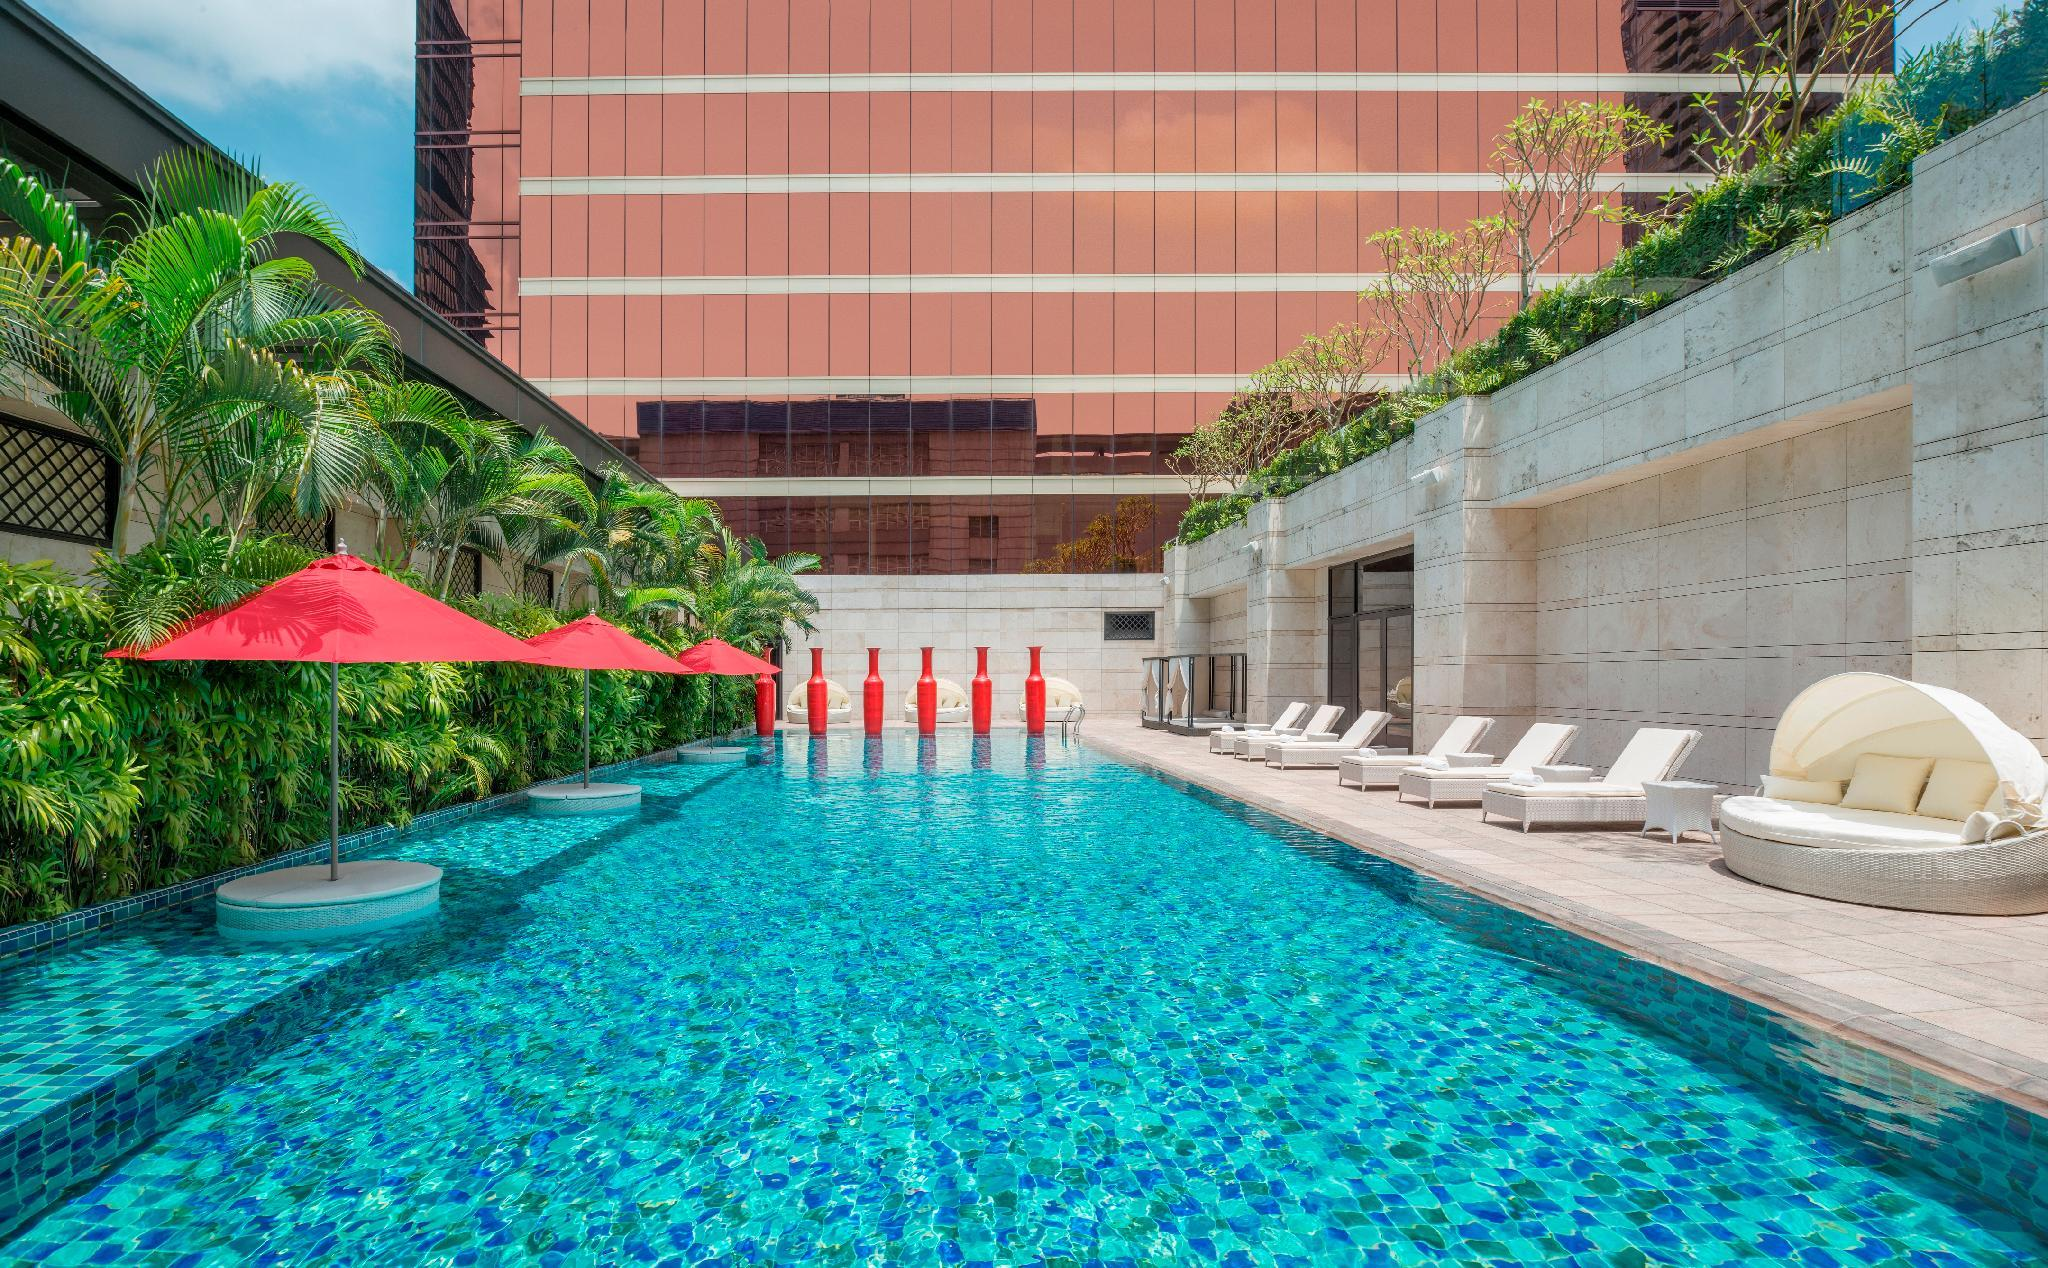 臺中市林酒店 (The Lin Hotel)線上訂房|Agoda.com